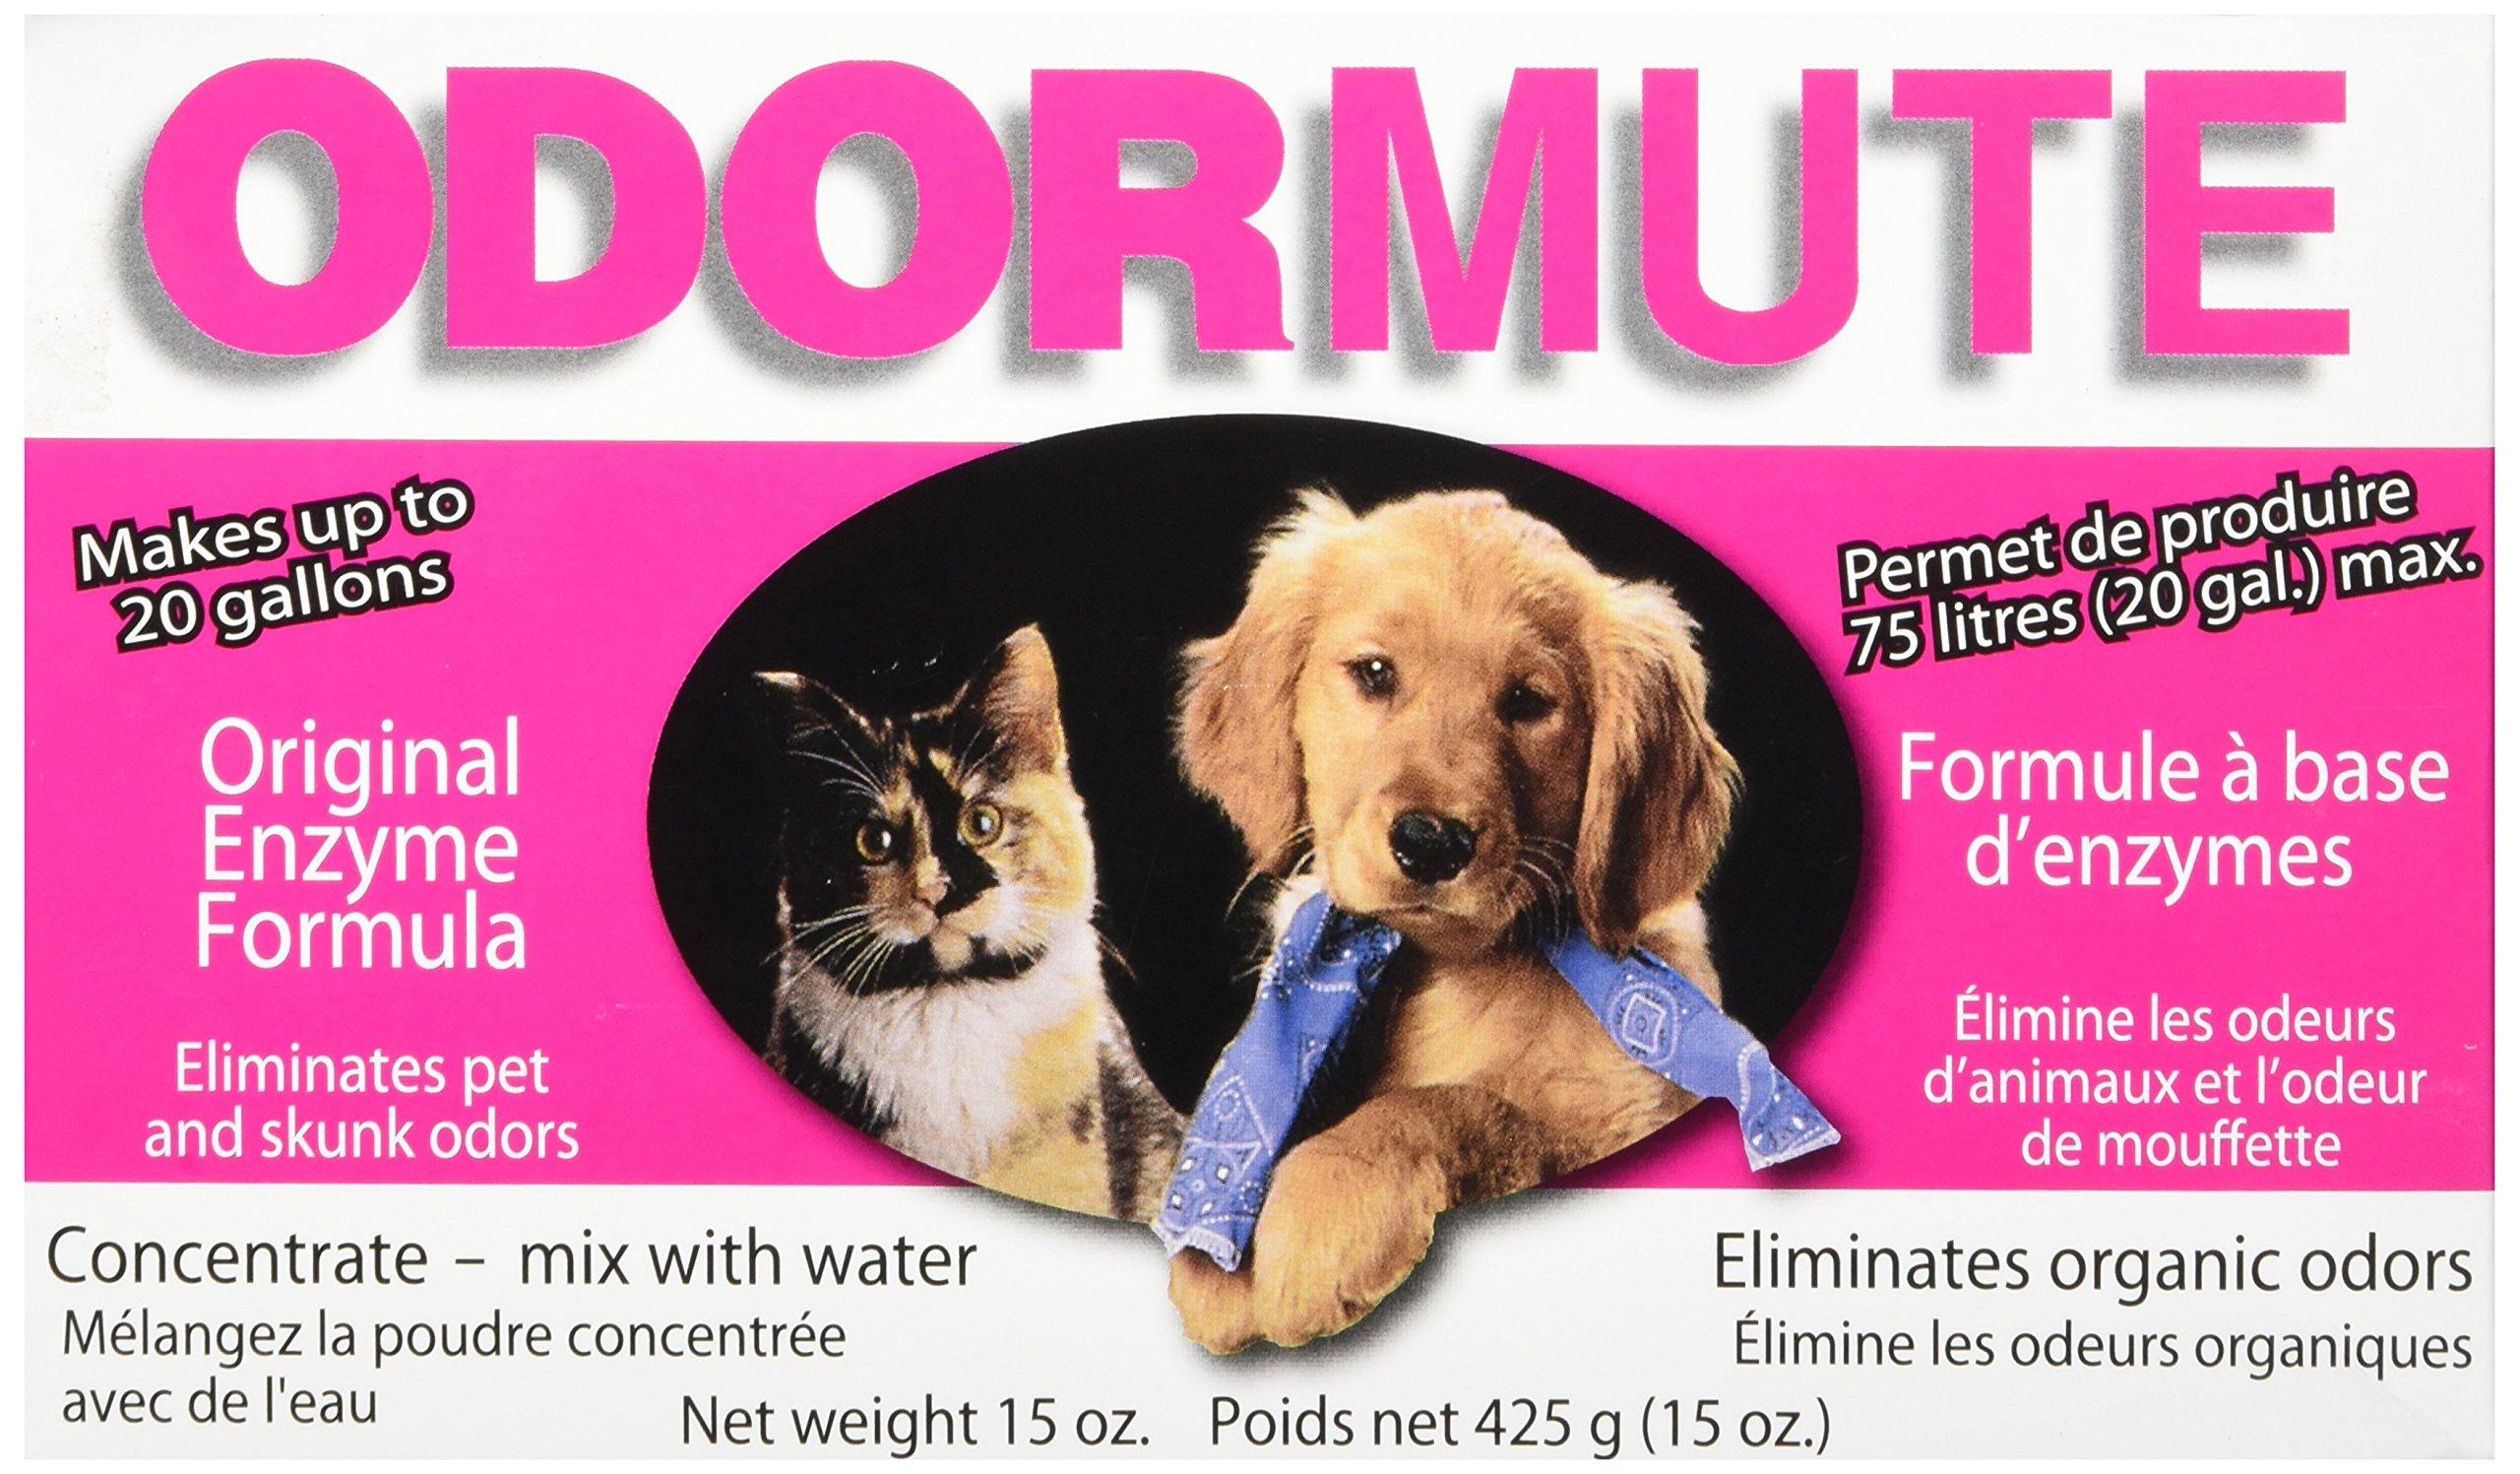 Odormute Dog and Cat Odor Eliminator, 15-Ounce by Hueter Toledo